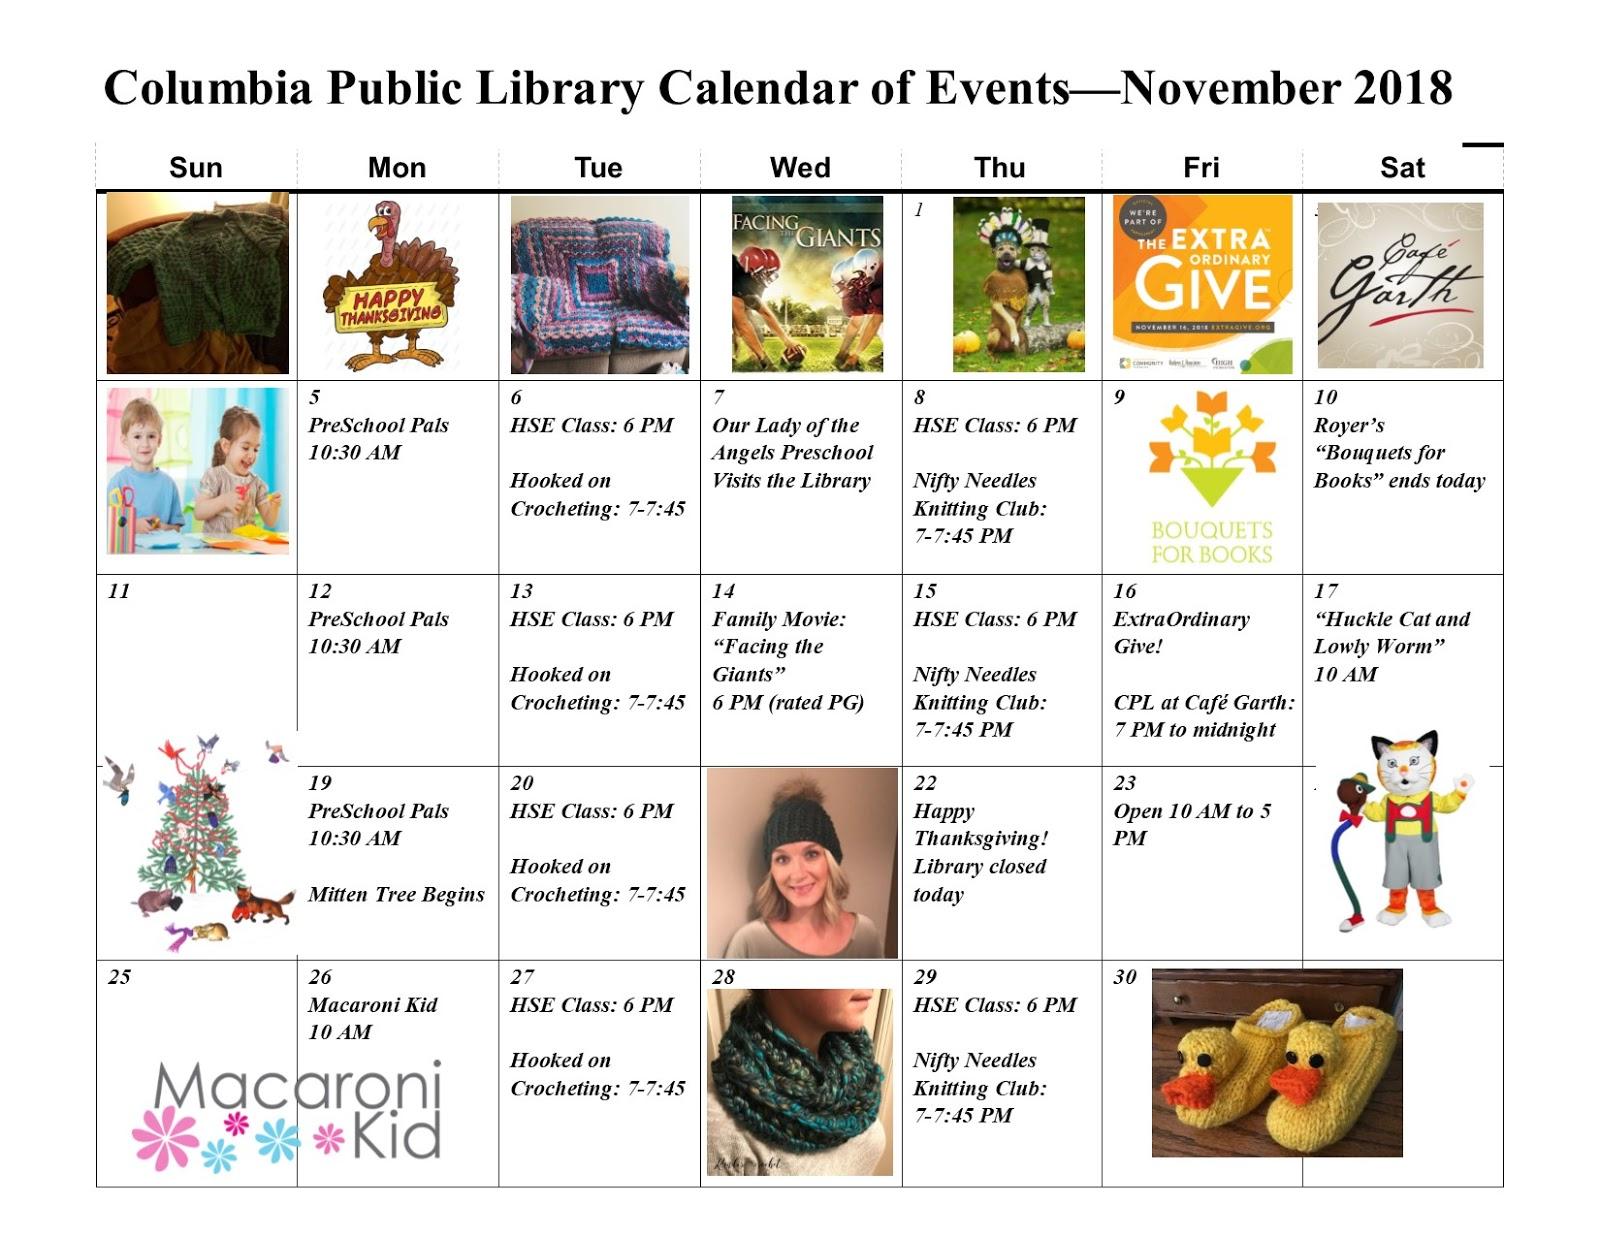 Columbia Spy Columbia Public Library November 2018 Calendar Of Events